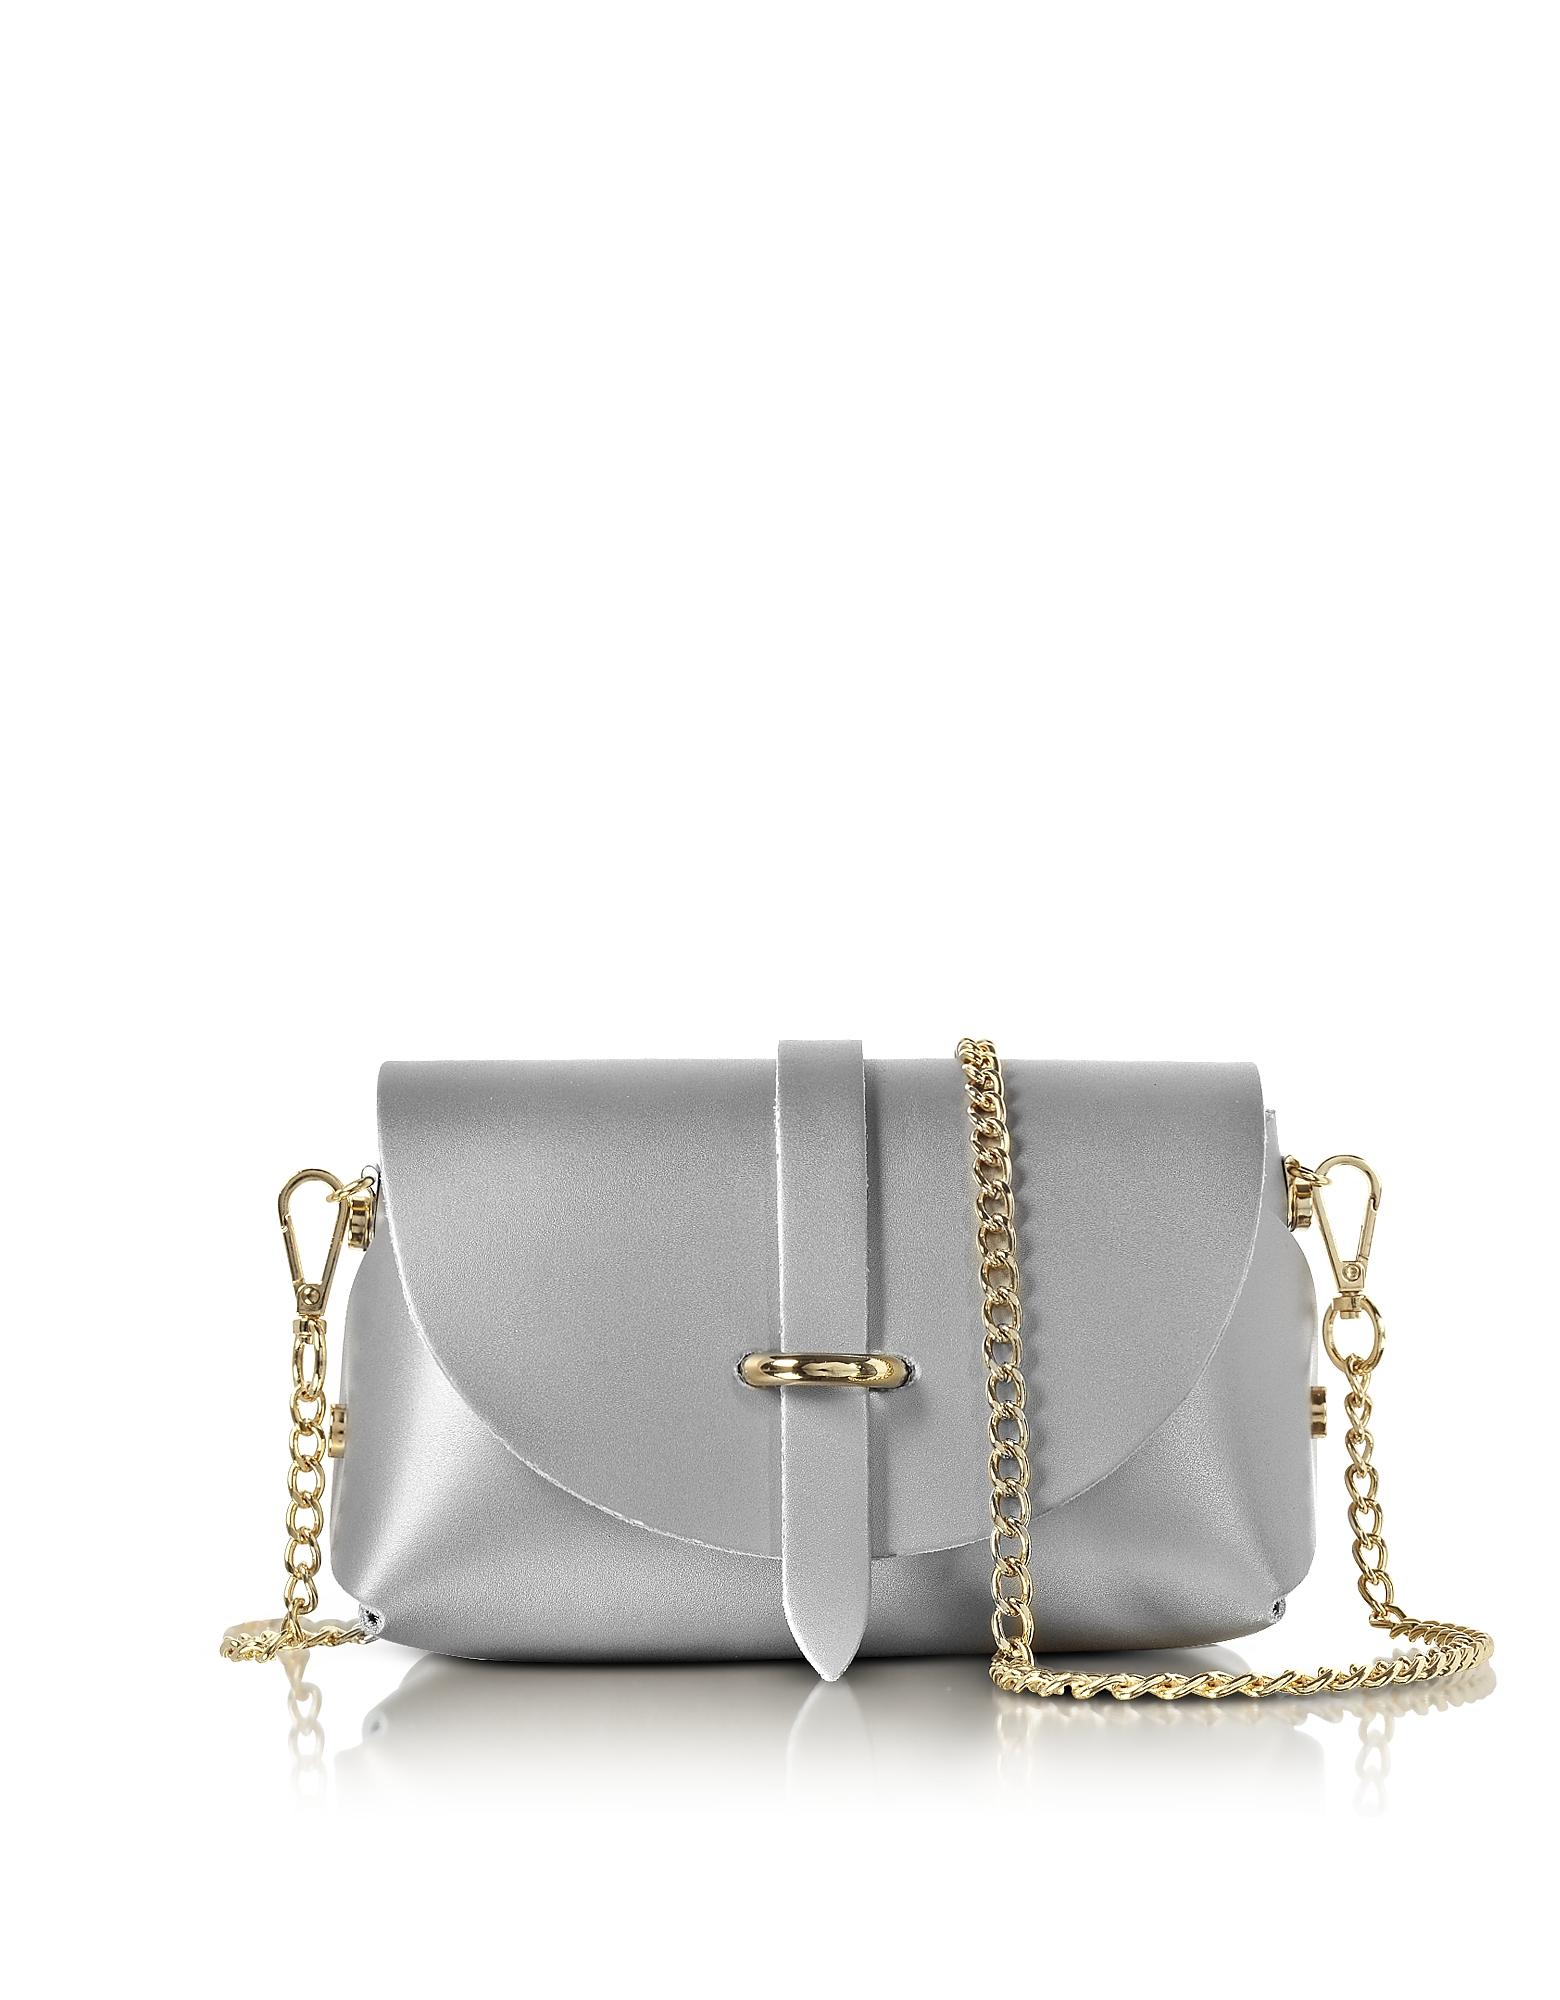 Le Parmentier Handbags, Caviar Metallic Leather Mini Shoulder Bag